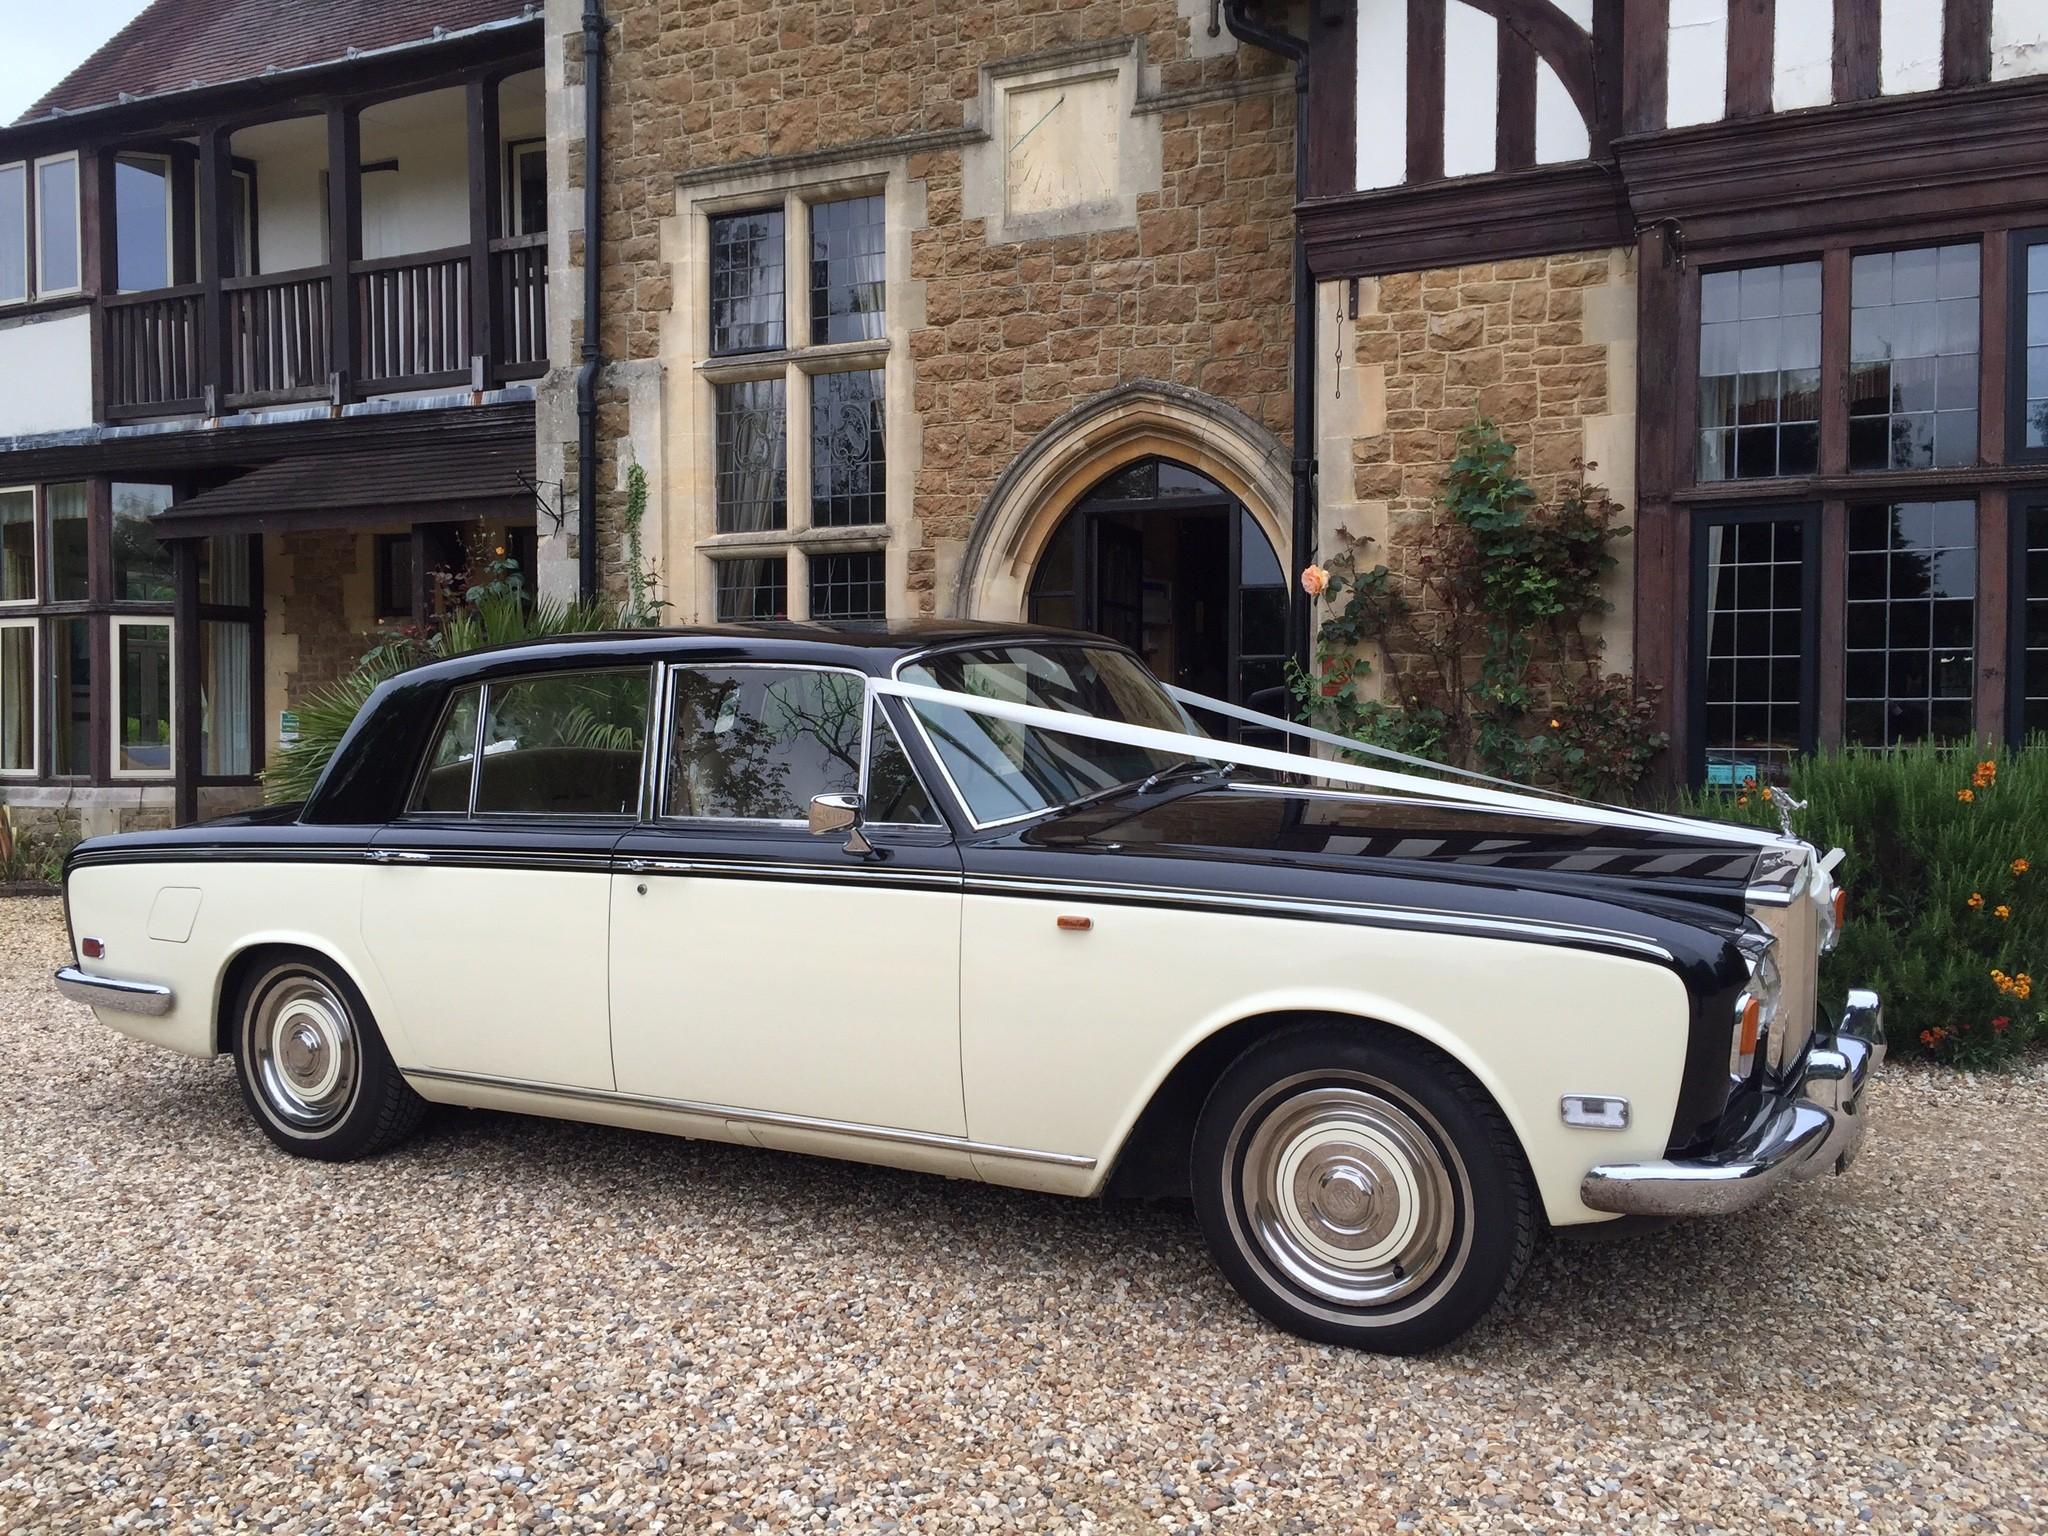 Rolls Royce Silver Shadow Hire Berkshire